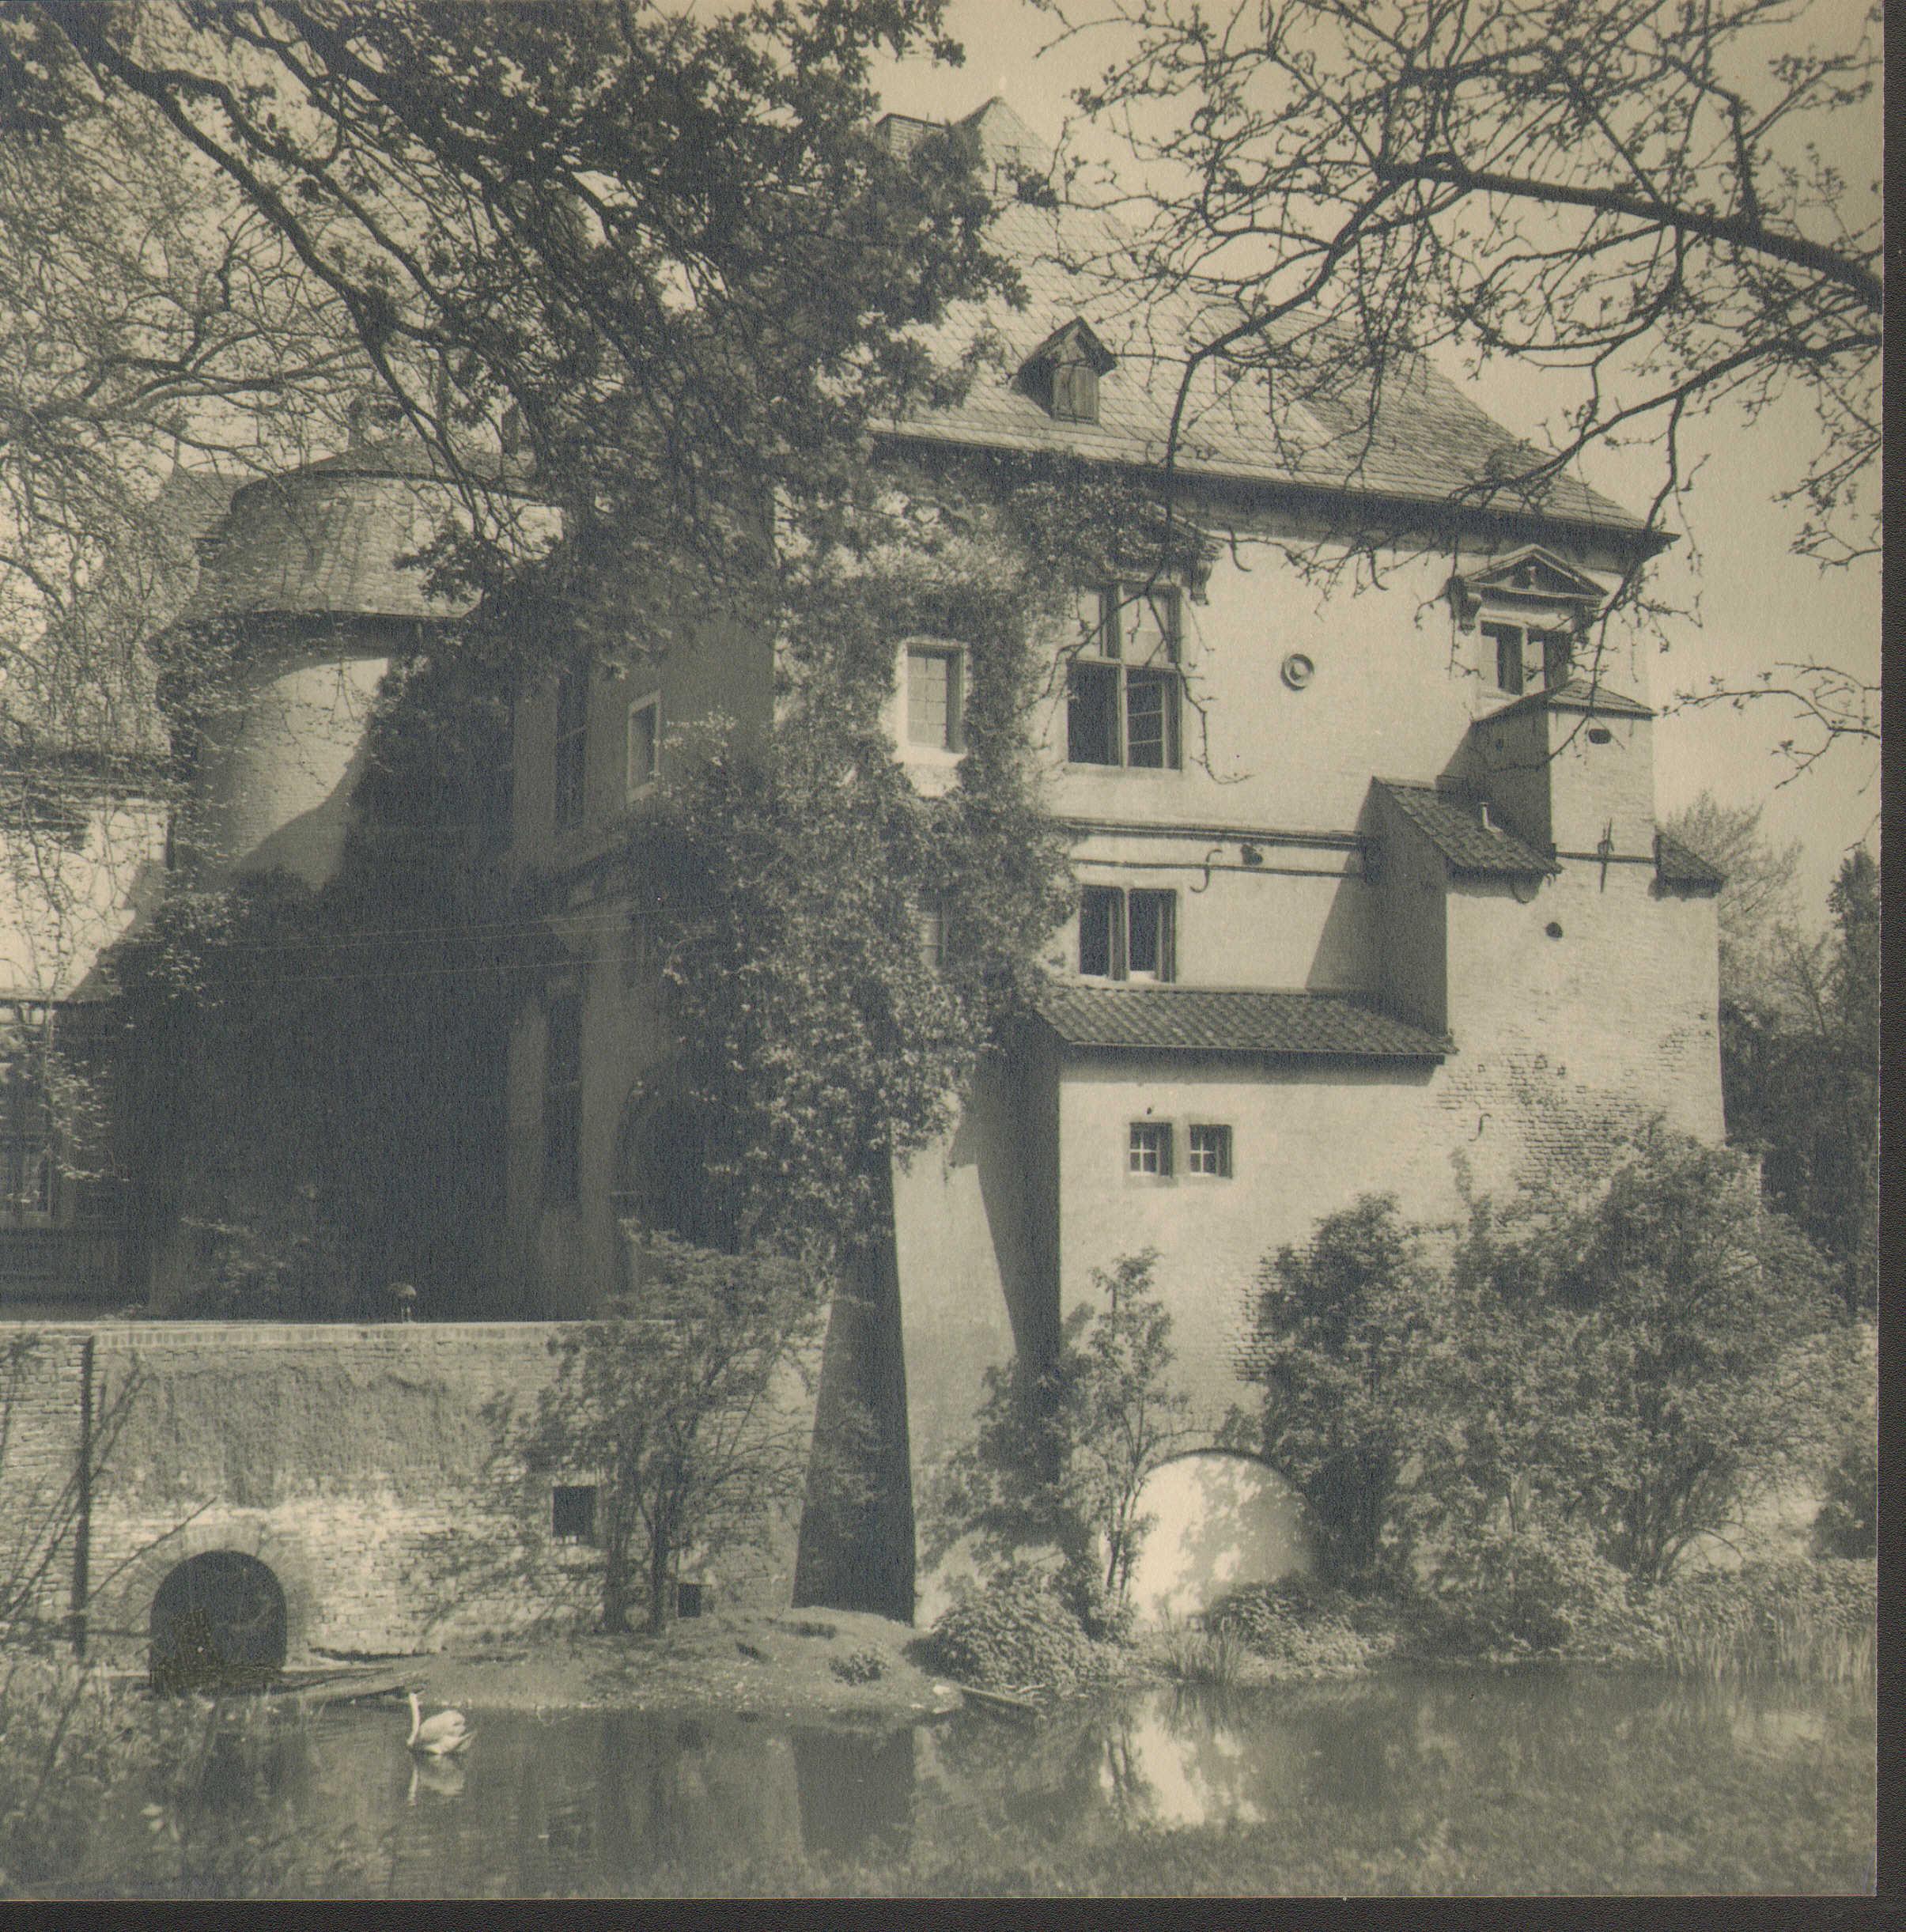 Schlossgeschichte(n) outdoor